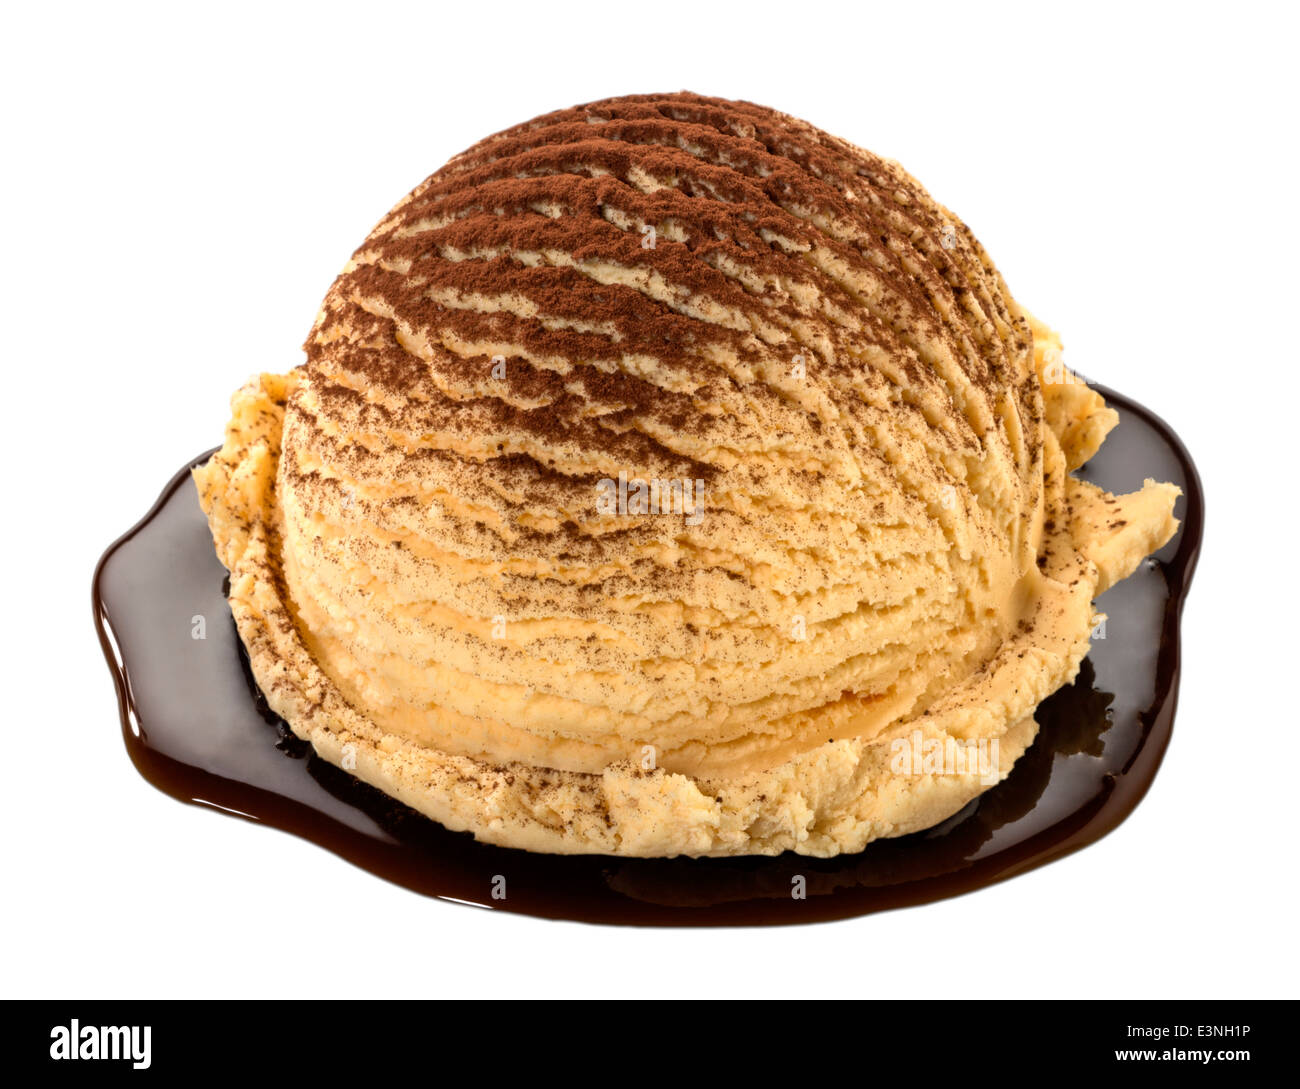 Tiramisu ice cream(+clipping path) - Stock Image